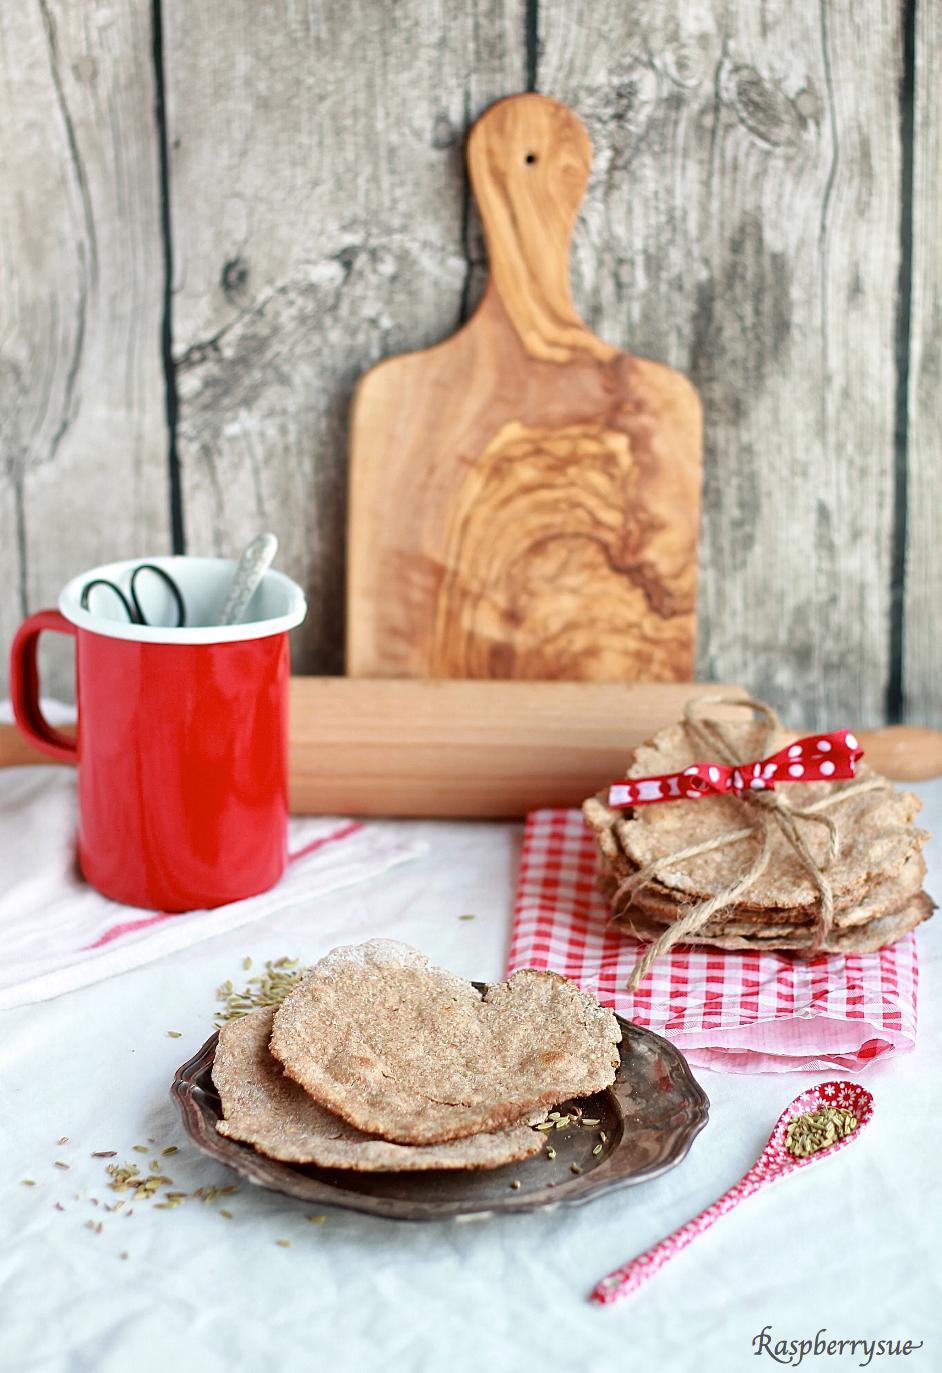 Experimente aus meiner Küche: Knäckebrot mit Kräutern #breadbakingfriday